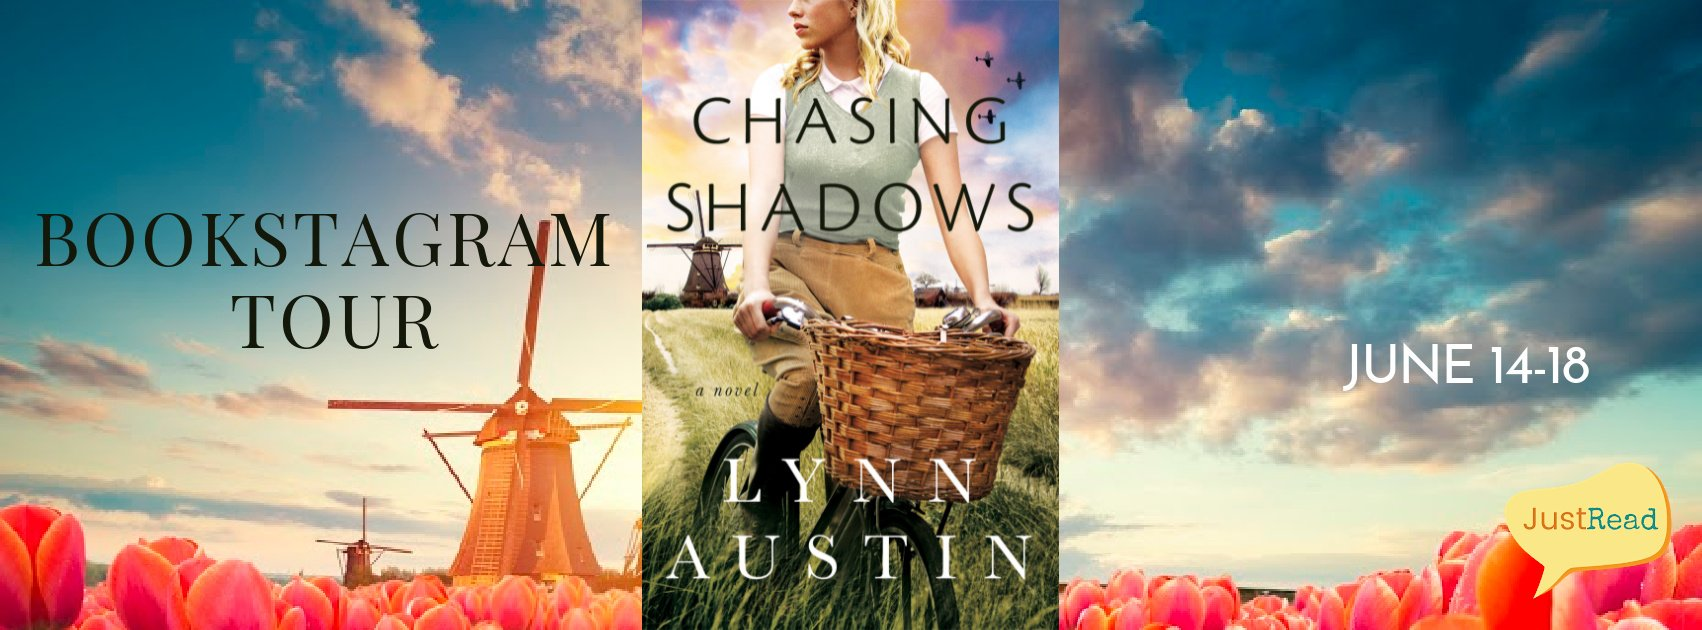 Chasing Shadows JustRead Bookstagram Tour